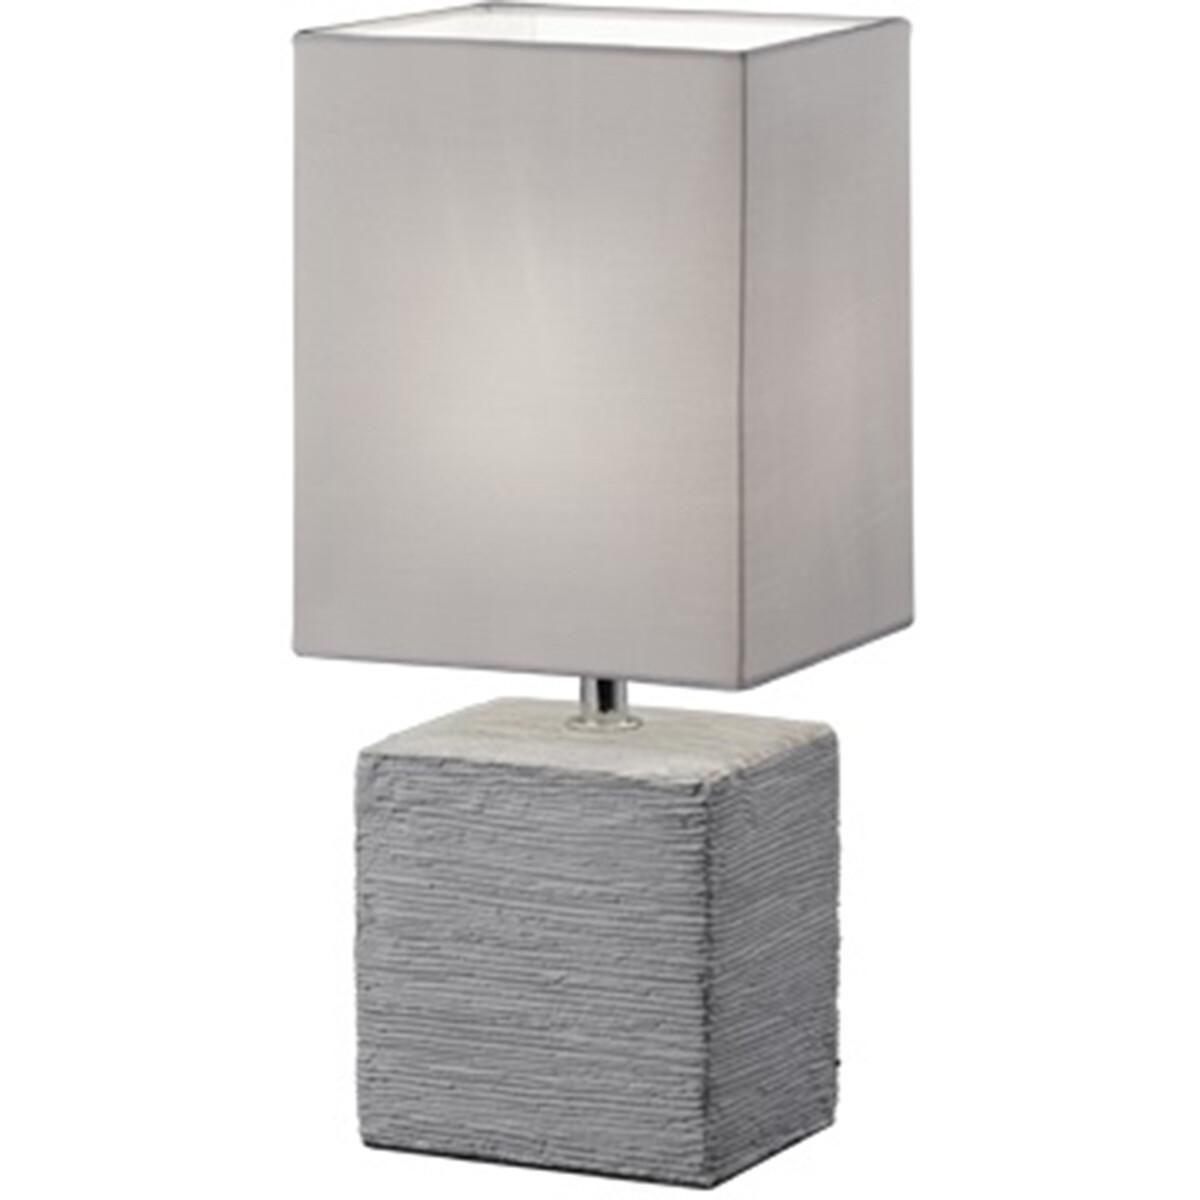 LED Tafellamp - Tafelverlichting - Trion Pinko - E14 Fitting - Rechthoek - Mat Titaan - Keramiek